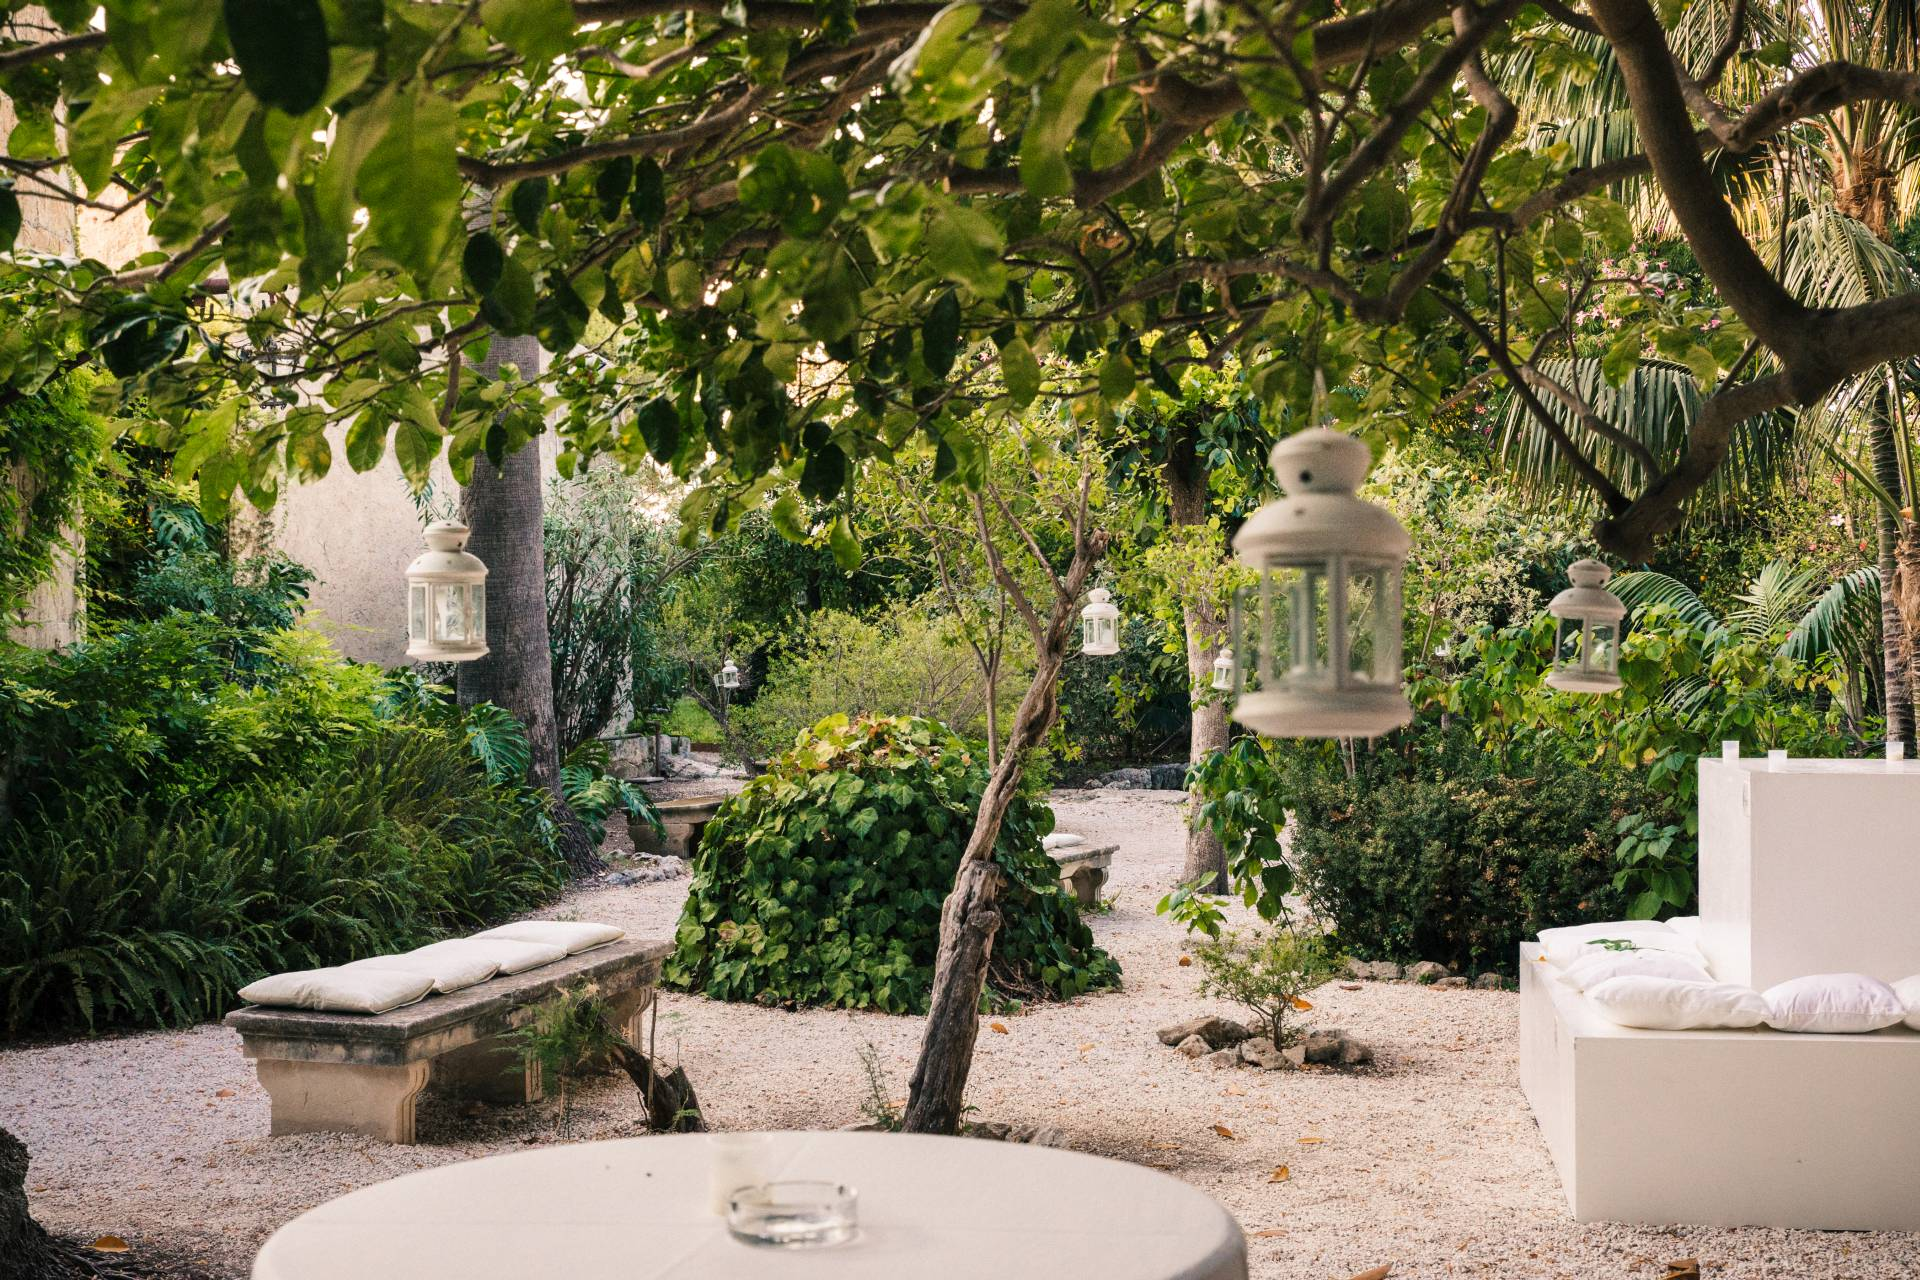 Giardino storico allestimento con cuscini e lanterne for Allestimento giardino